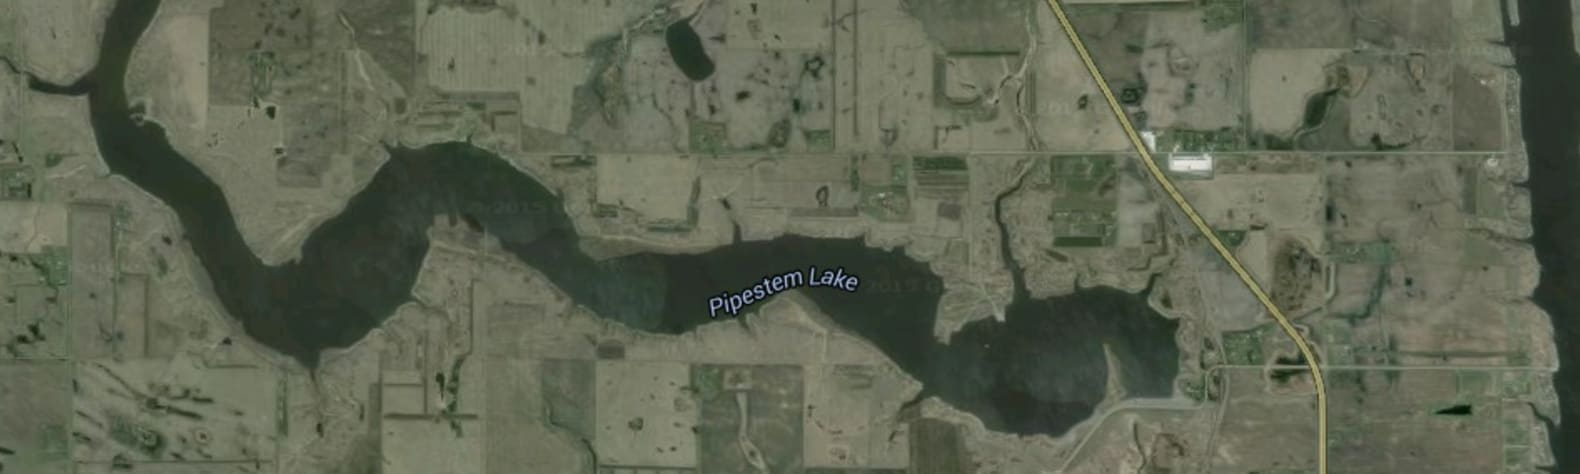 Pipestem Lake